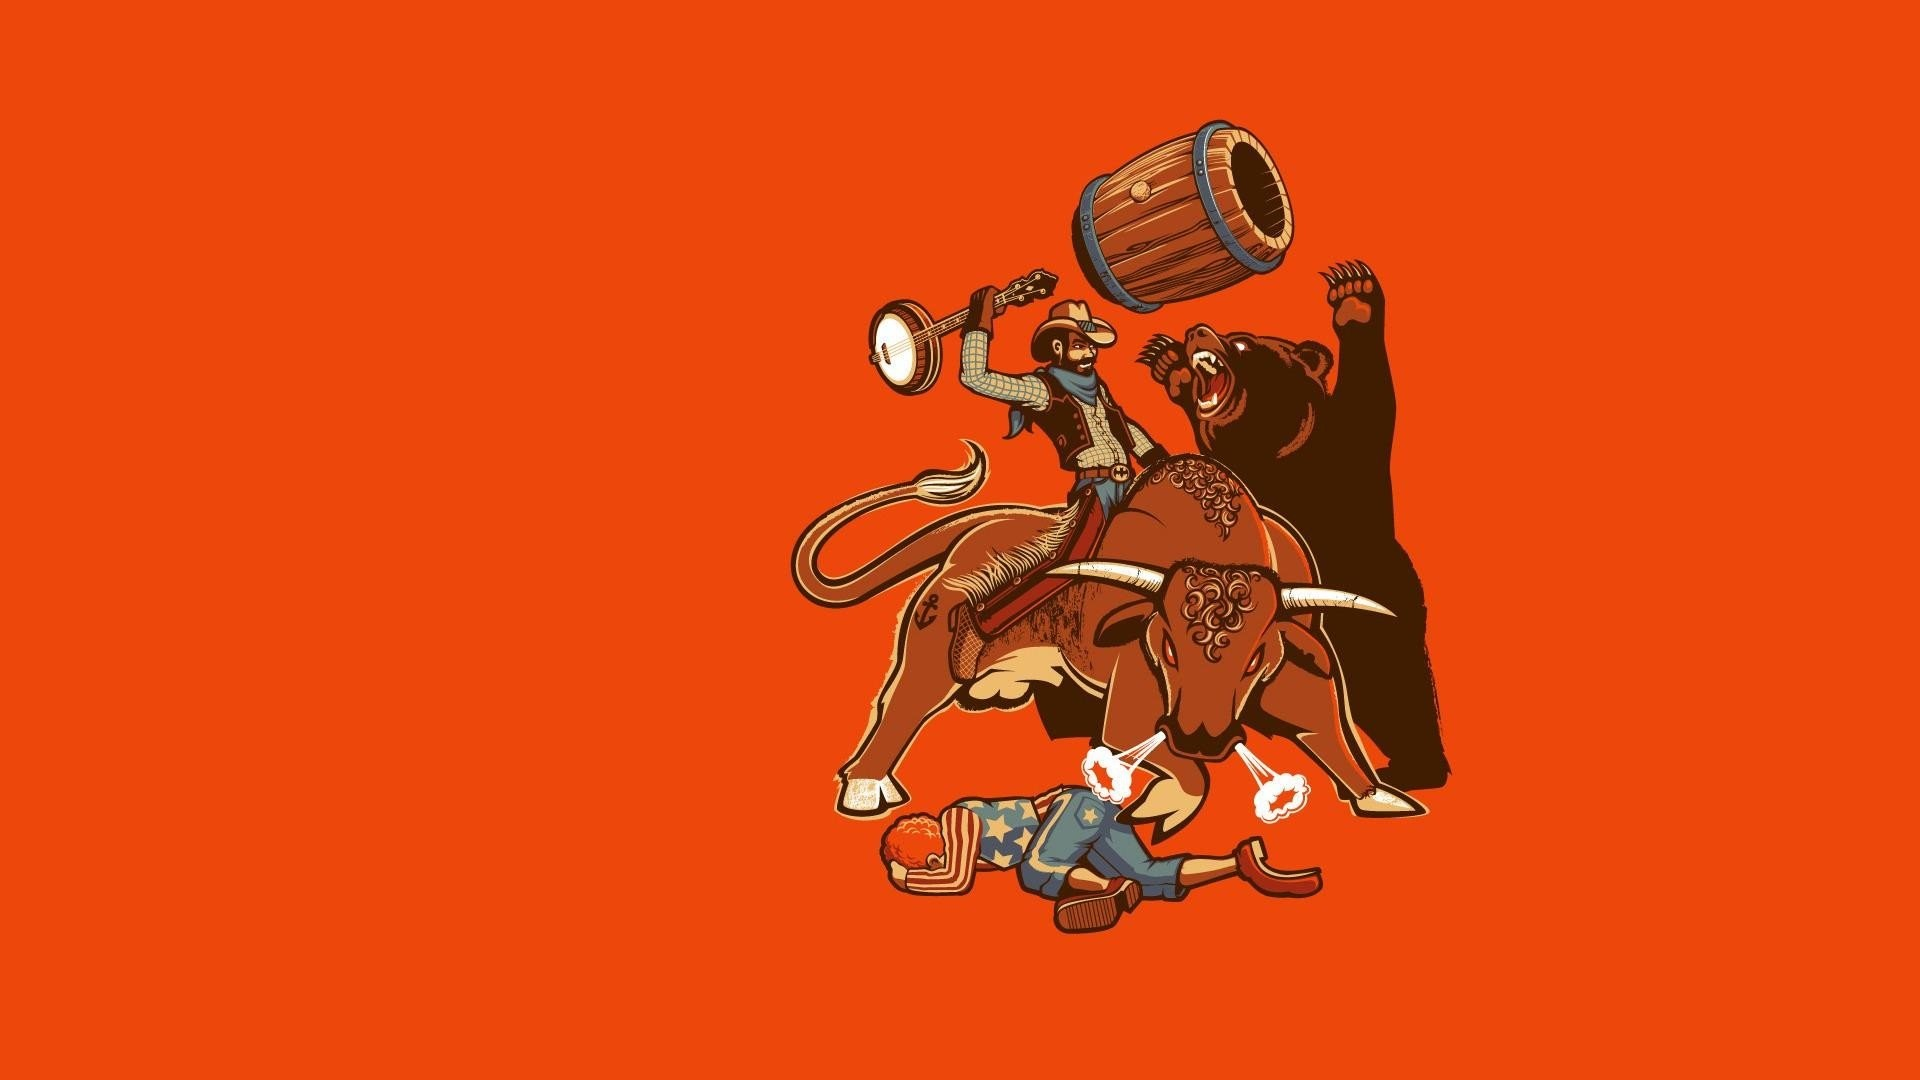 Minimalistic funny bears rodeo cowboy wallpaper | | 297475 .